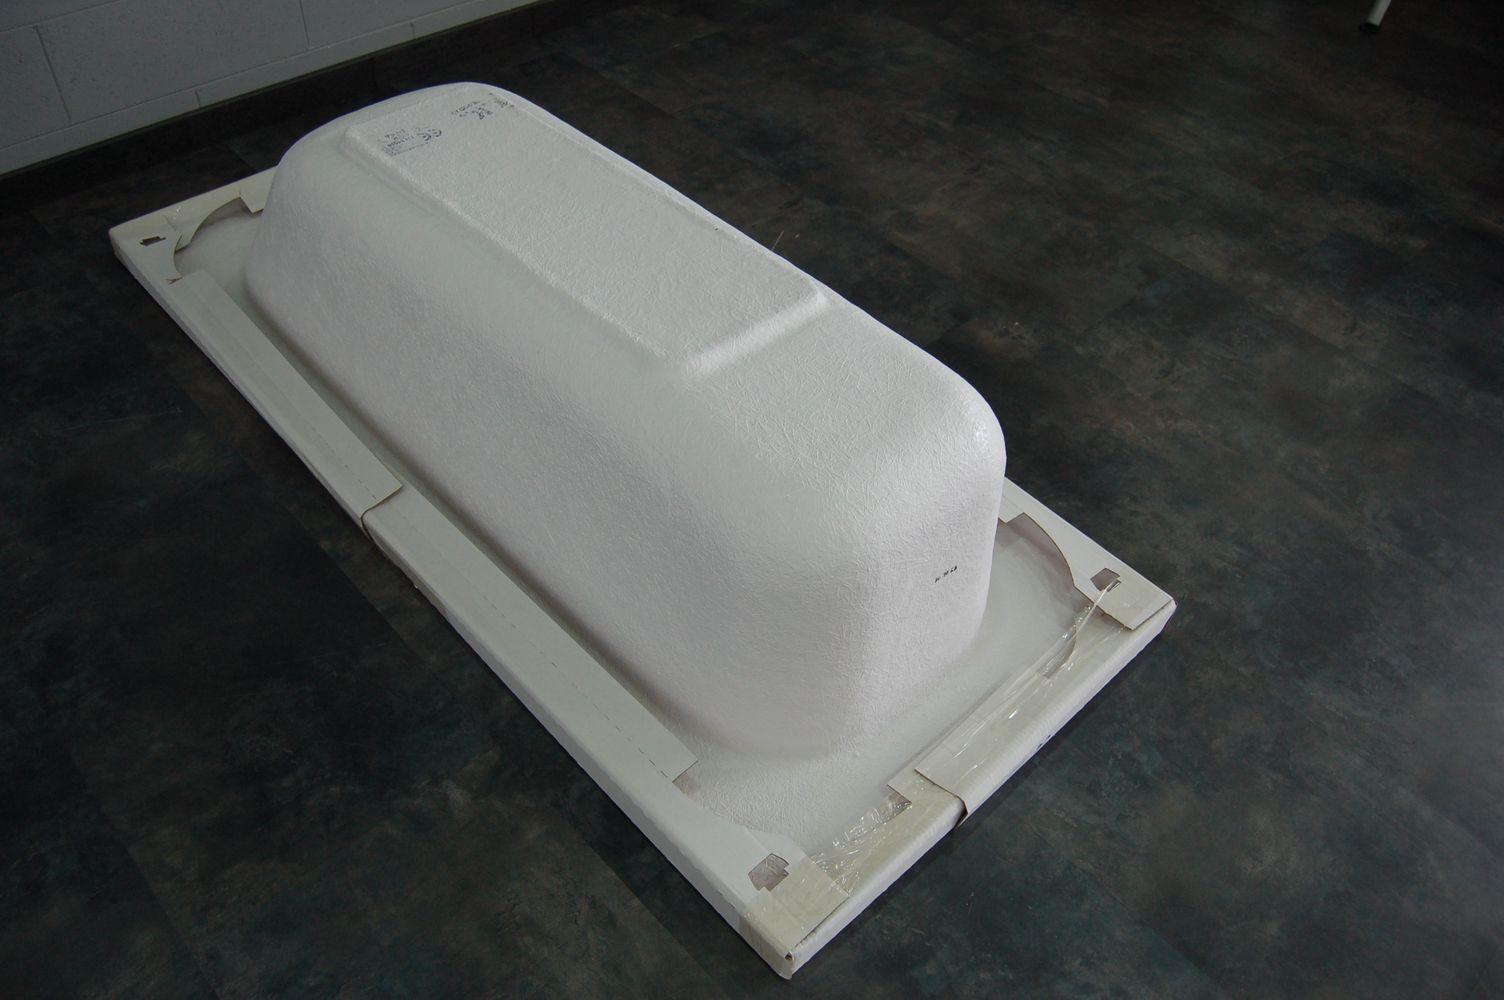 Vasca Da Bagno Vetroresina : Vasche da sovrapposizione produzione vasche da bagno acryltech